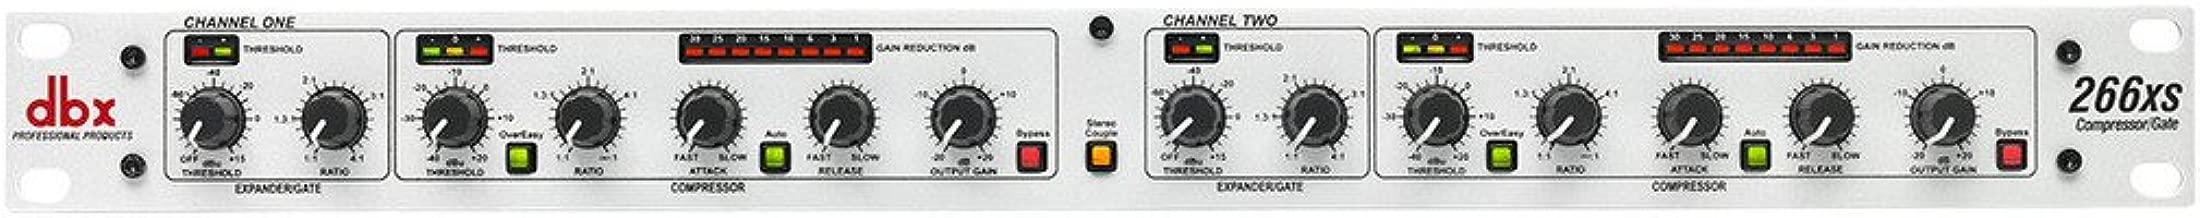 dbx 266xs Compressor/Gate (266xs)